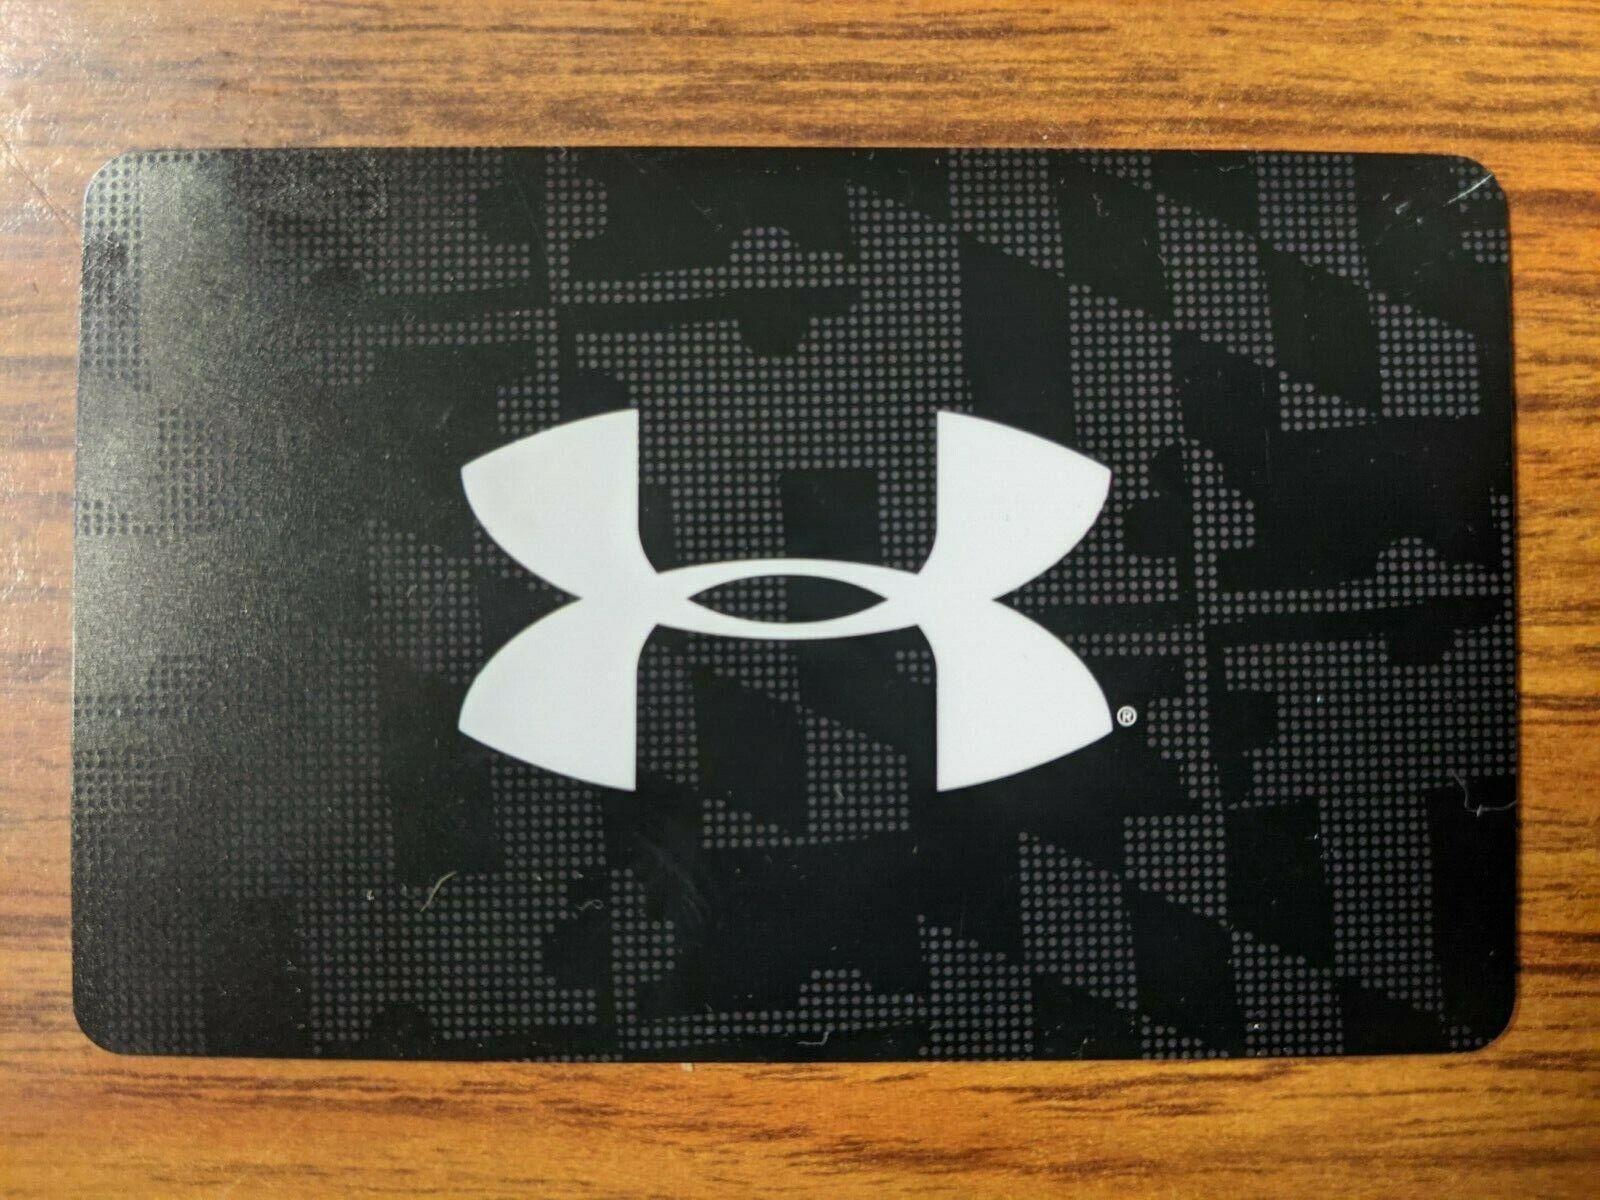 252.00 Under Armour Gift Card Merchandise Credit BALANCE 252.00 - $225.00